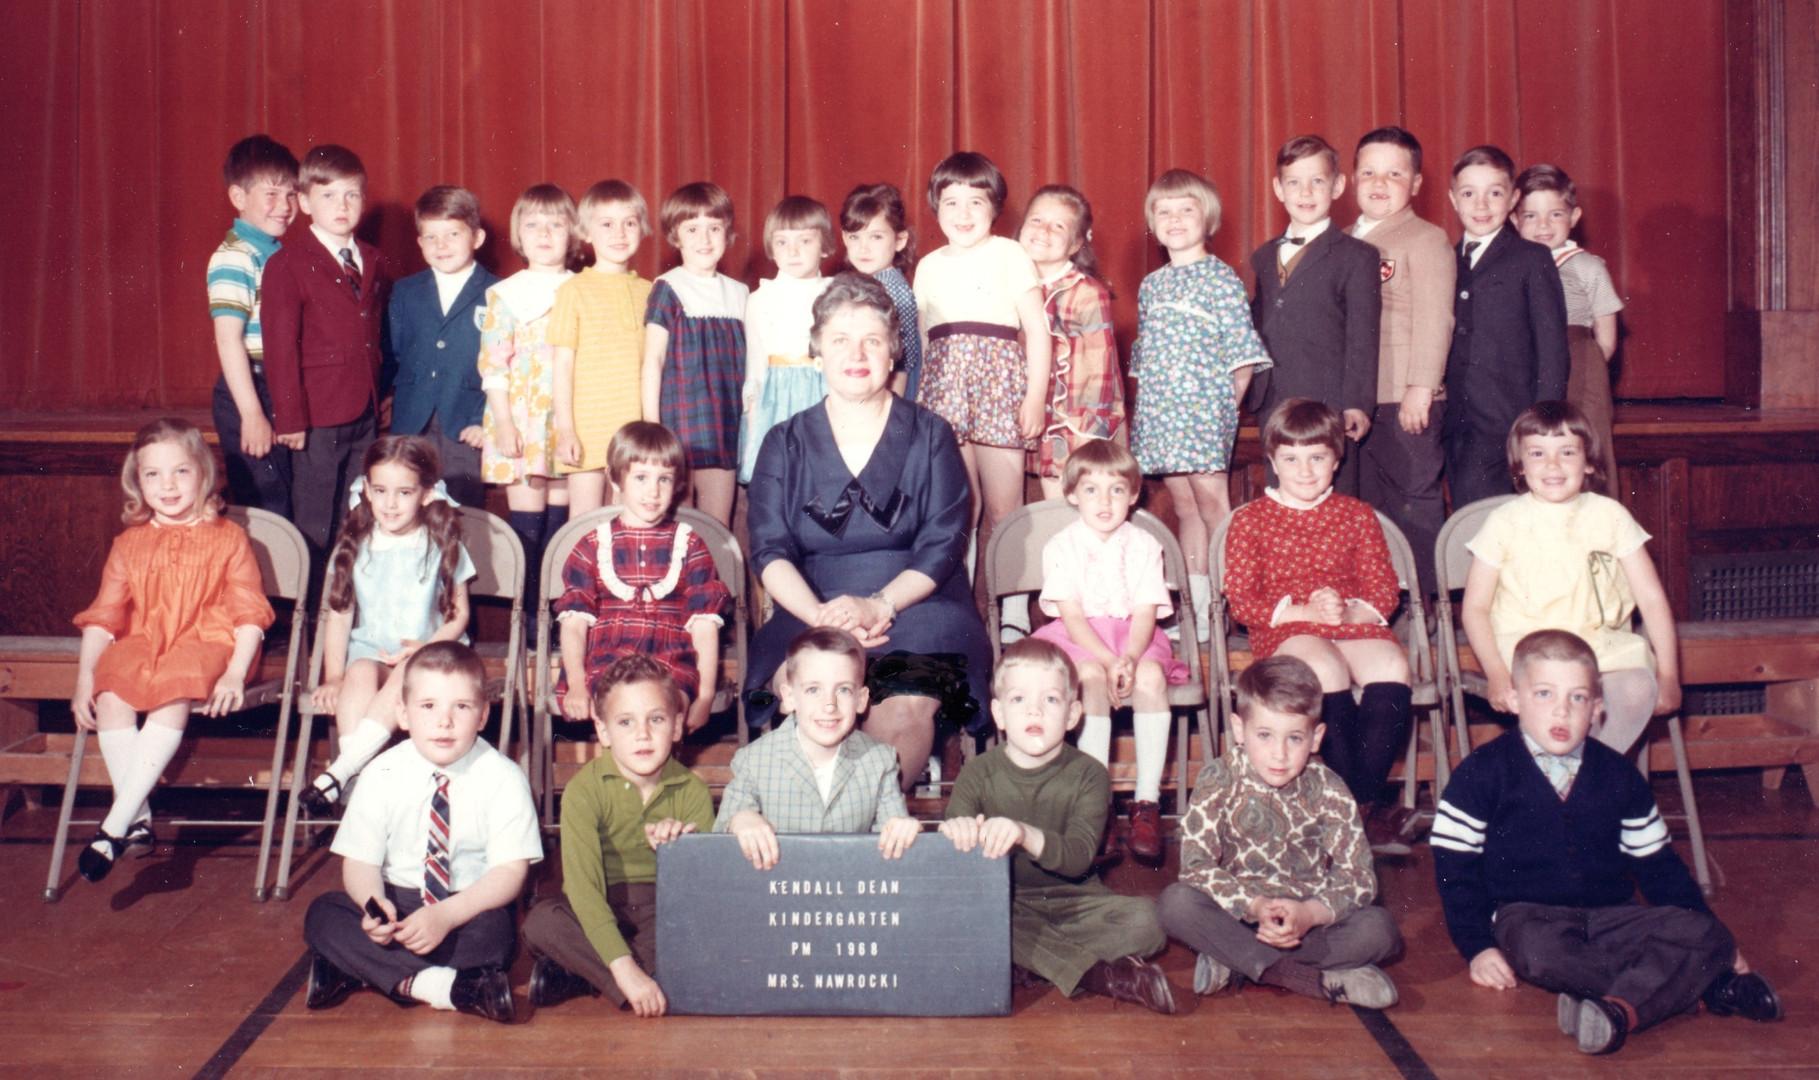 Kindergarten PM  - Mrs Nawrocki